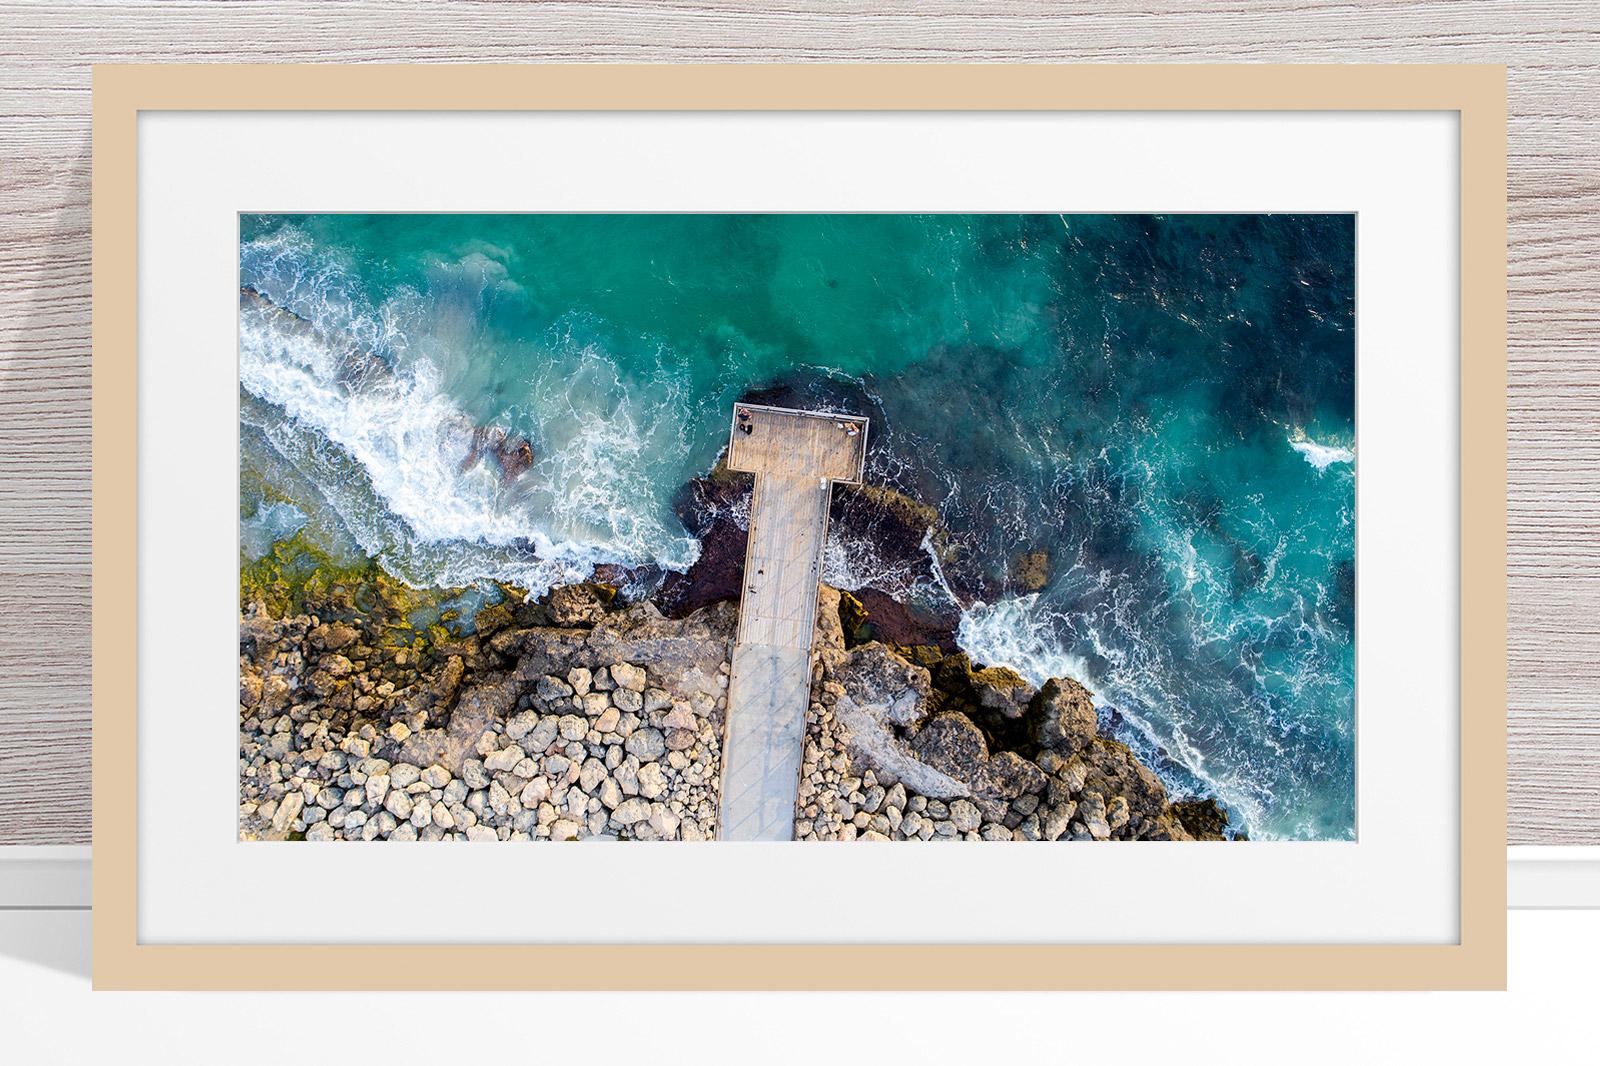 057 - Jason Mazur - 'North Beach Jetty' Light Frame